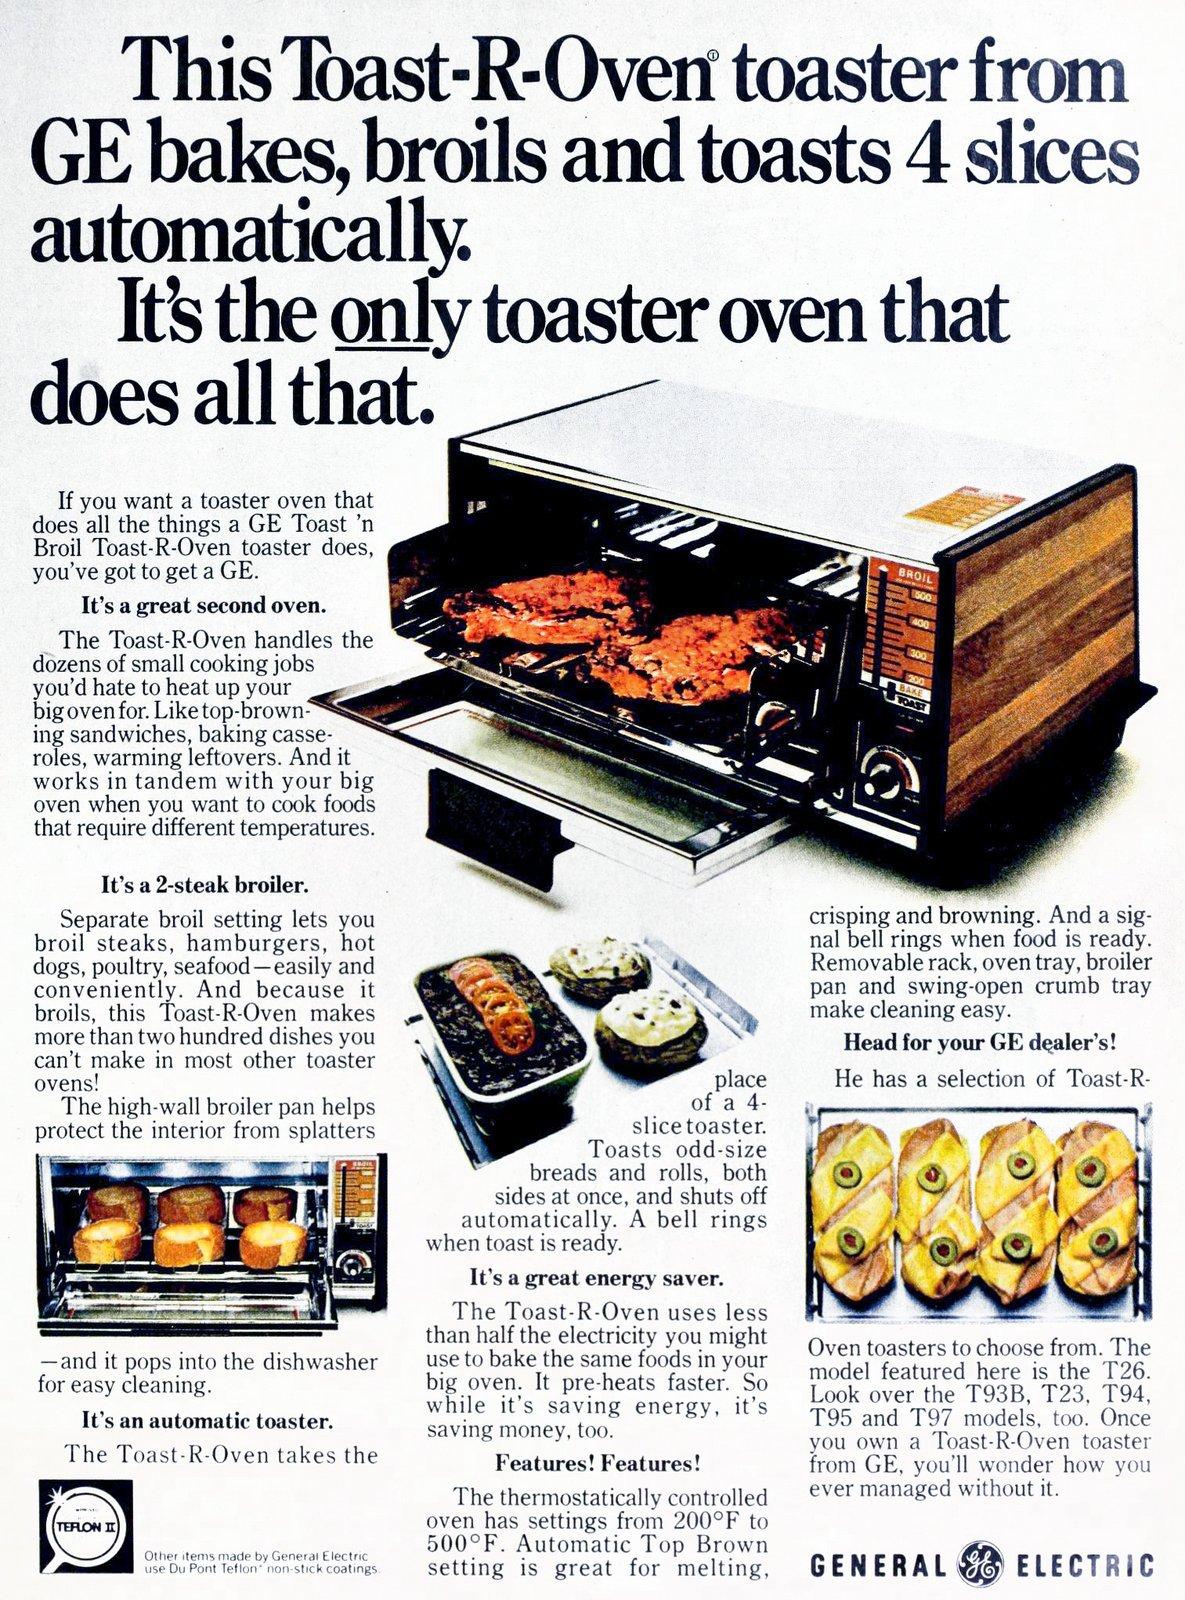 GE retro toaster oven (1976)